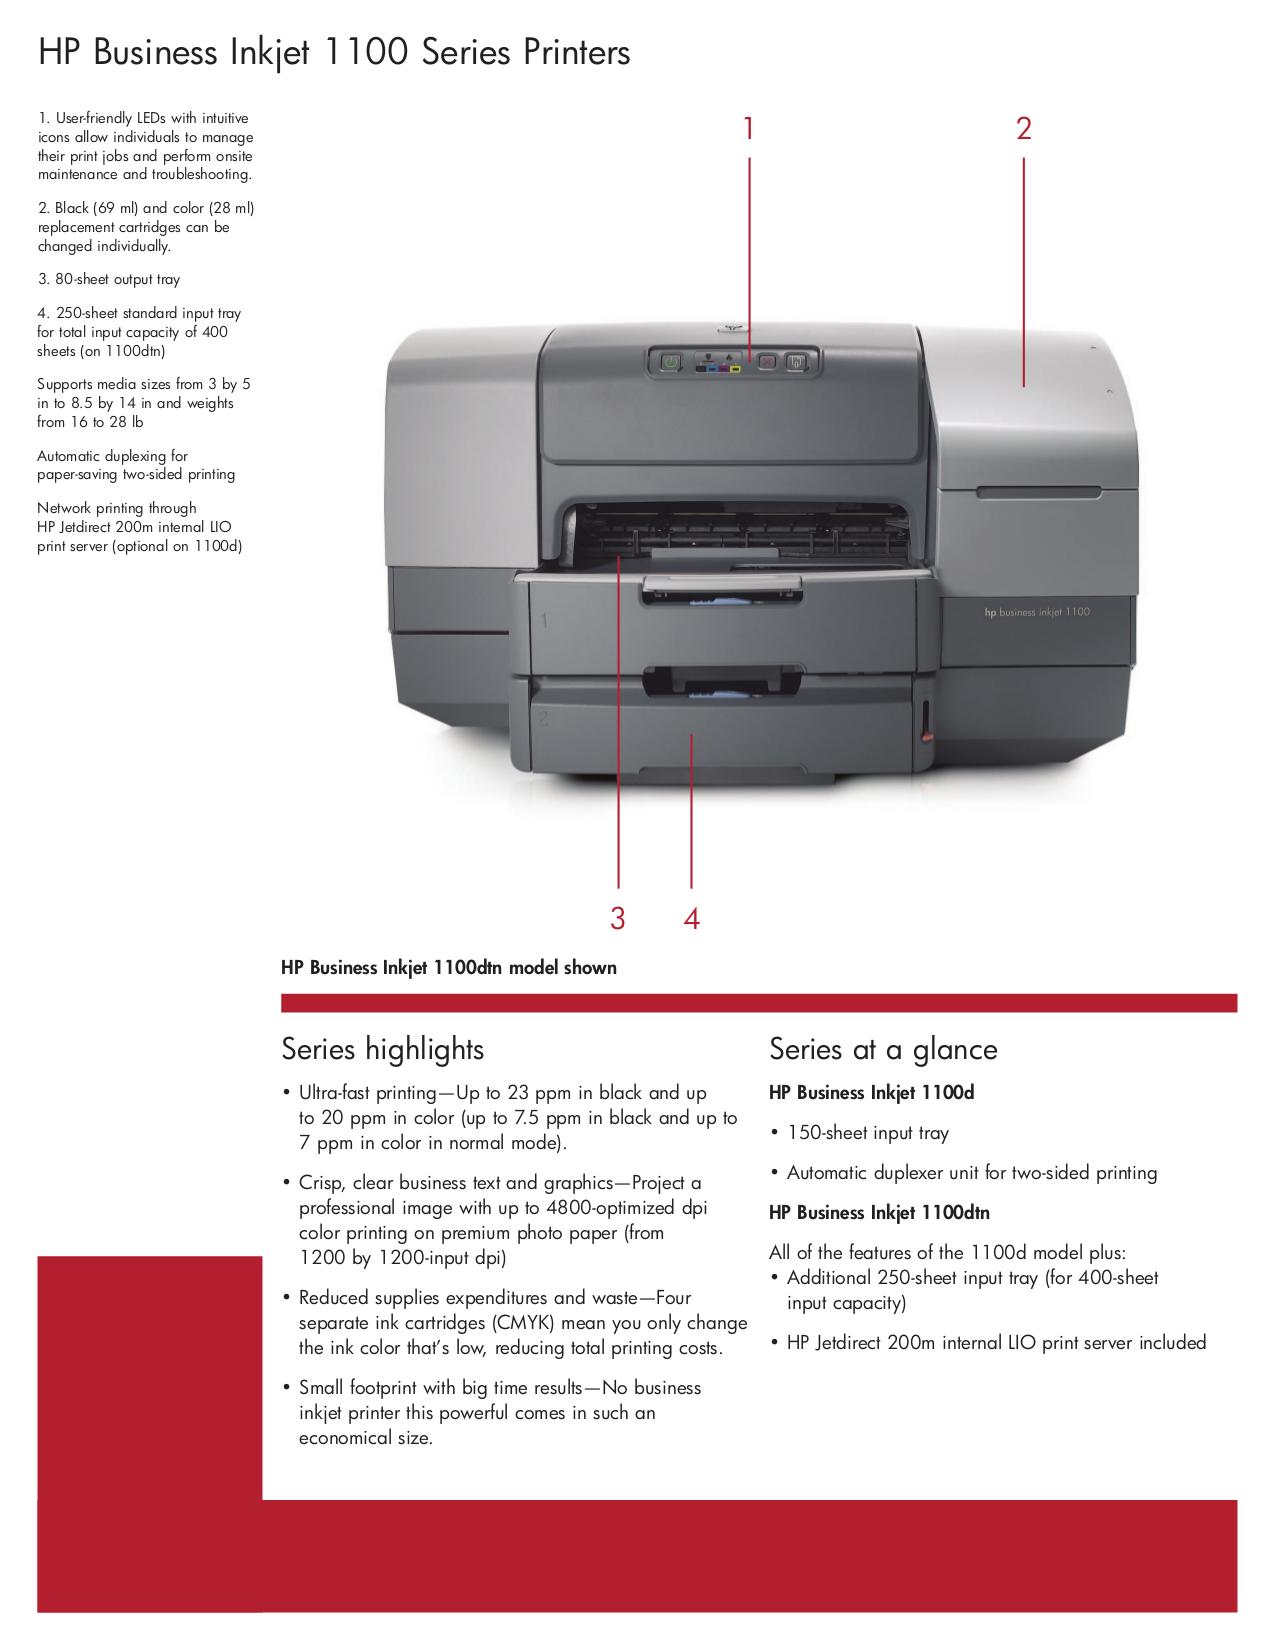 Hp Inkjet 1100 Manual One Word Quickstart Guide Book Laserjet 1100a Service Pdf For Printer Business 1100d Rh Umlib Com